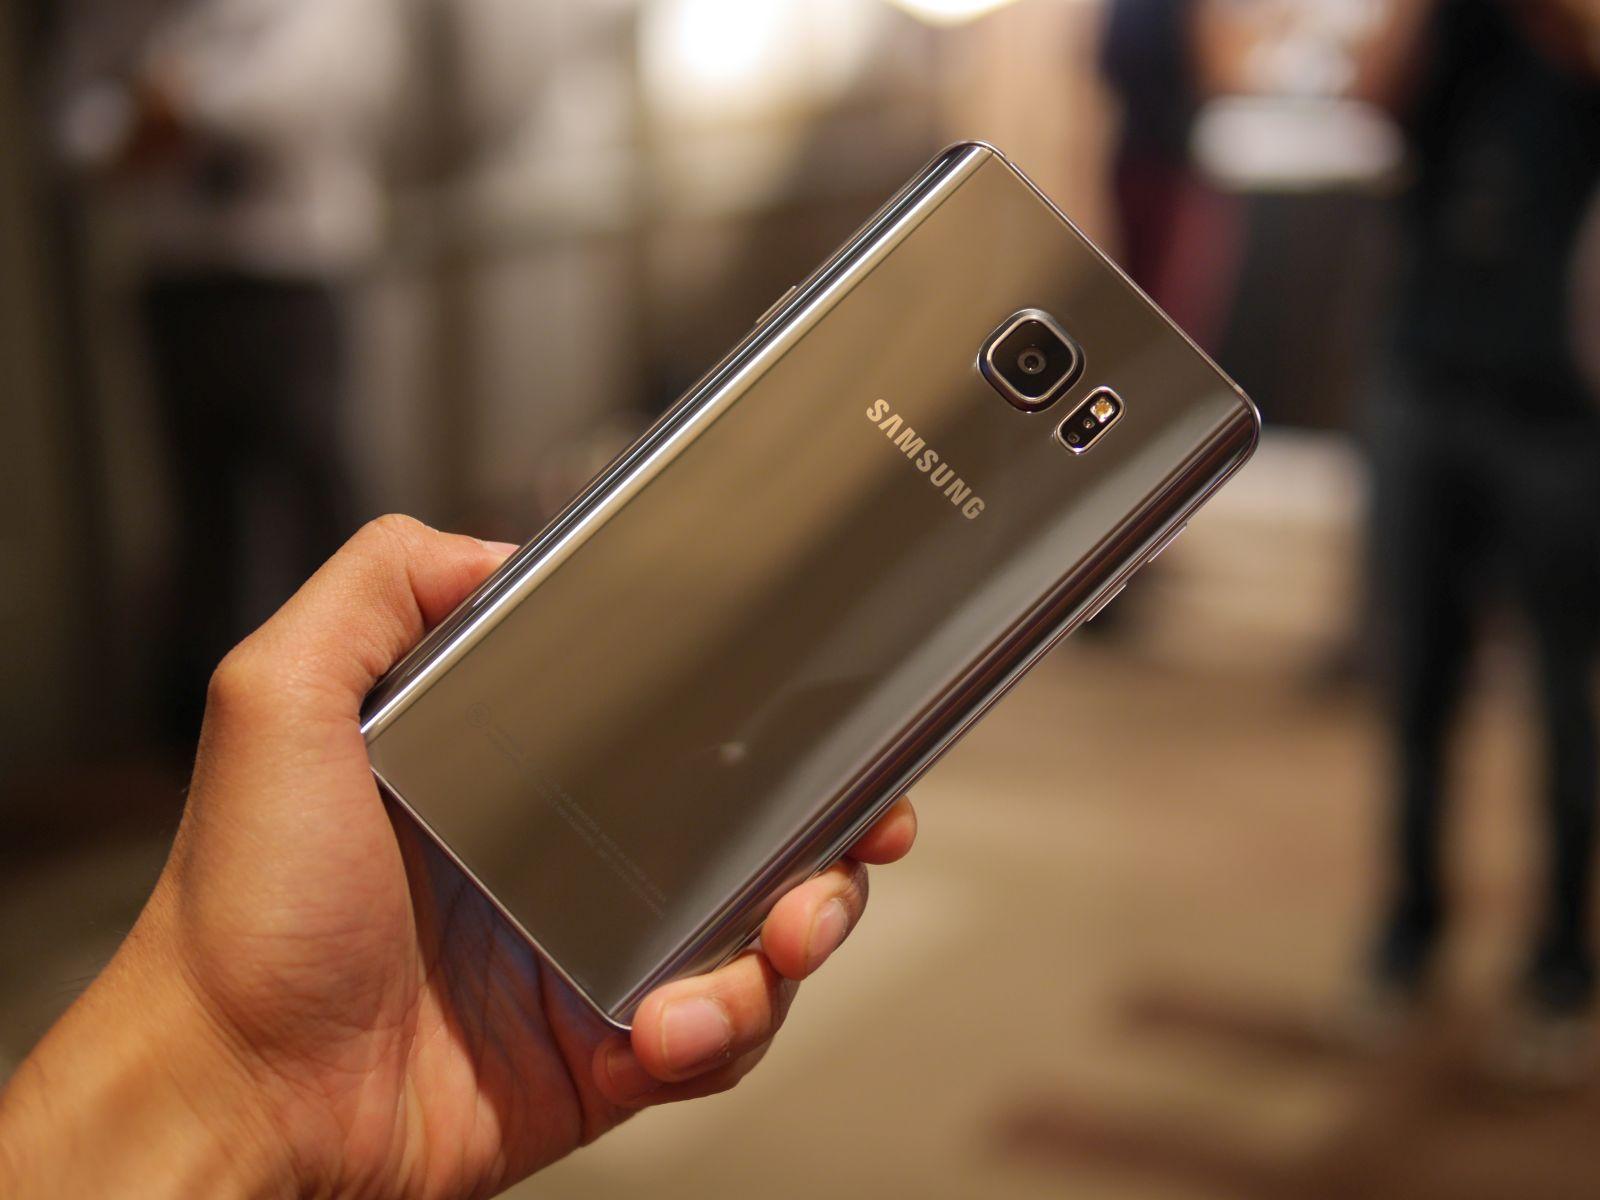 Samsung Galaxy S6 edge Plus 13